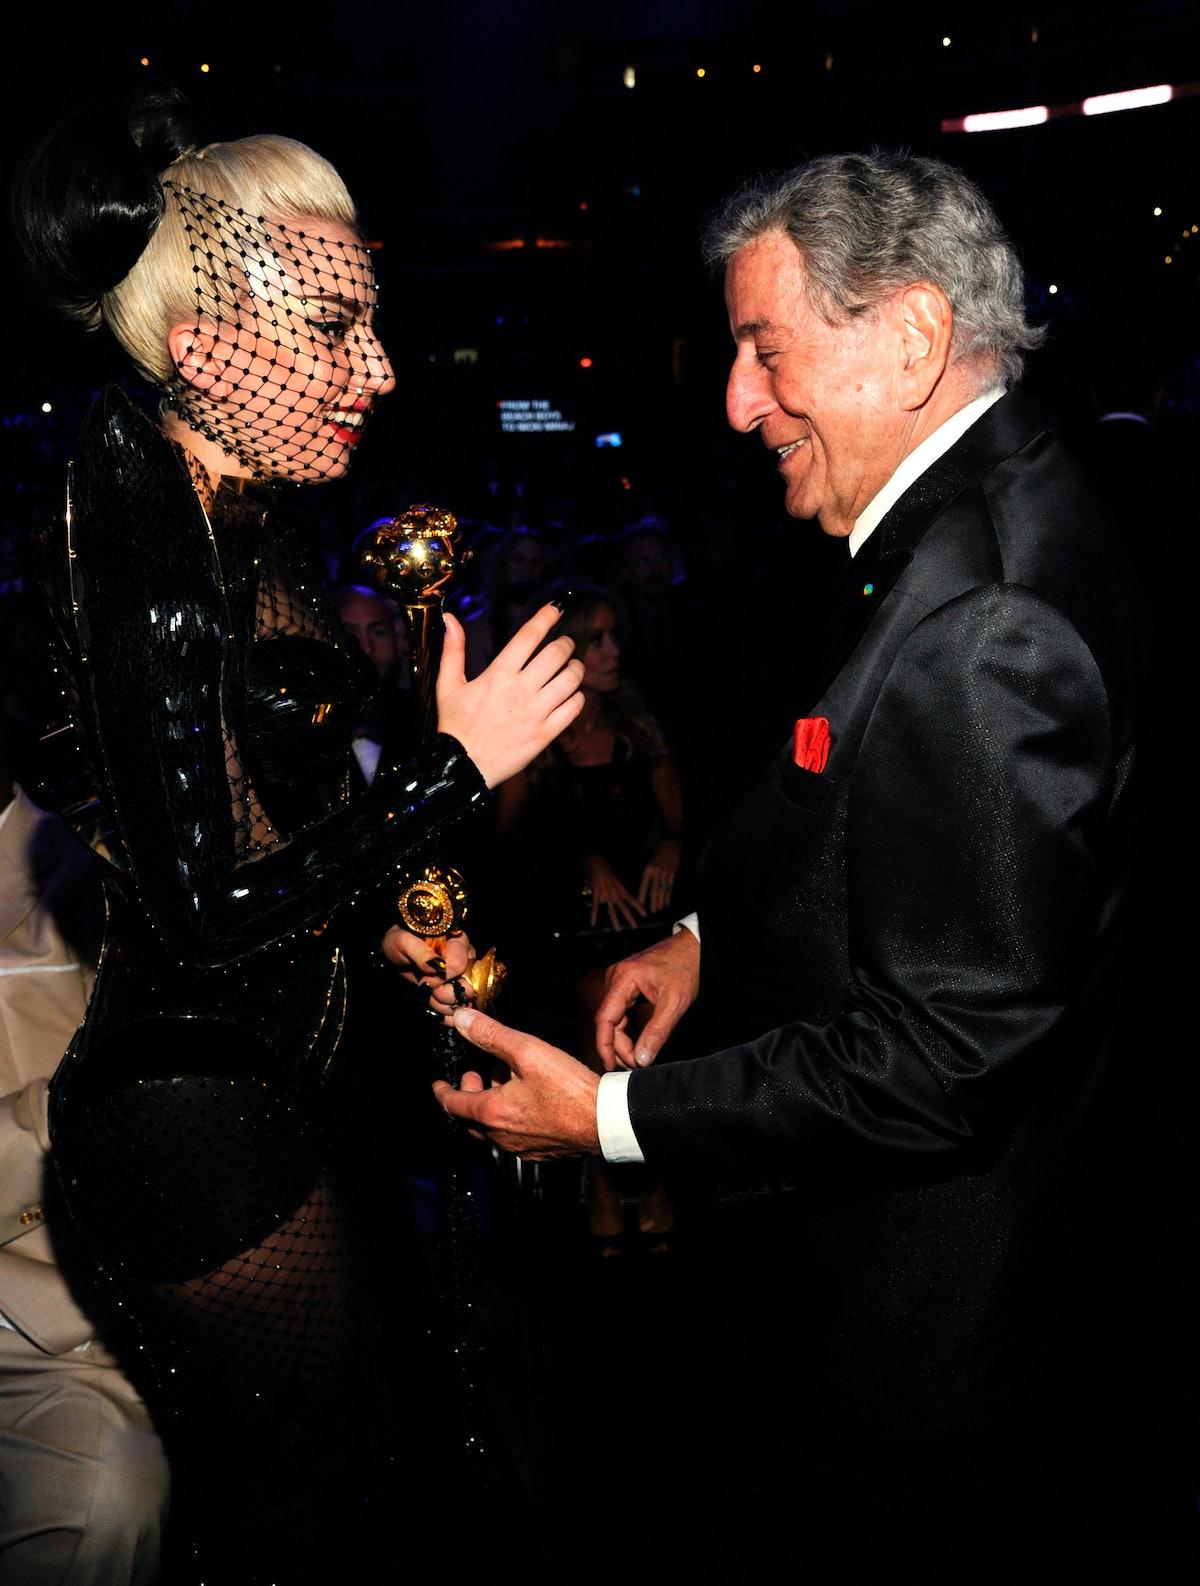 Lady Gaga and Tony Bennett in 2012.